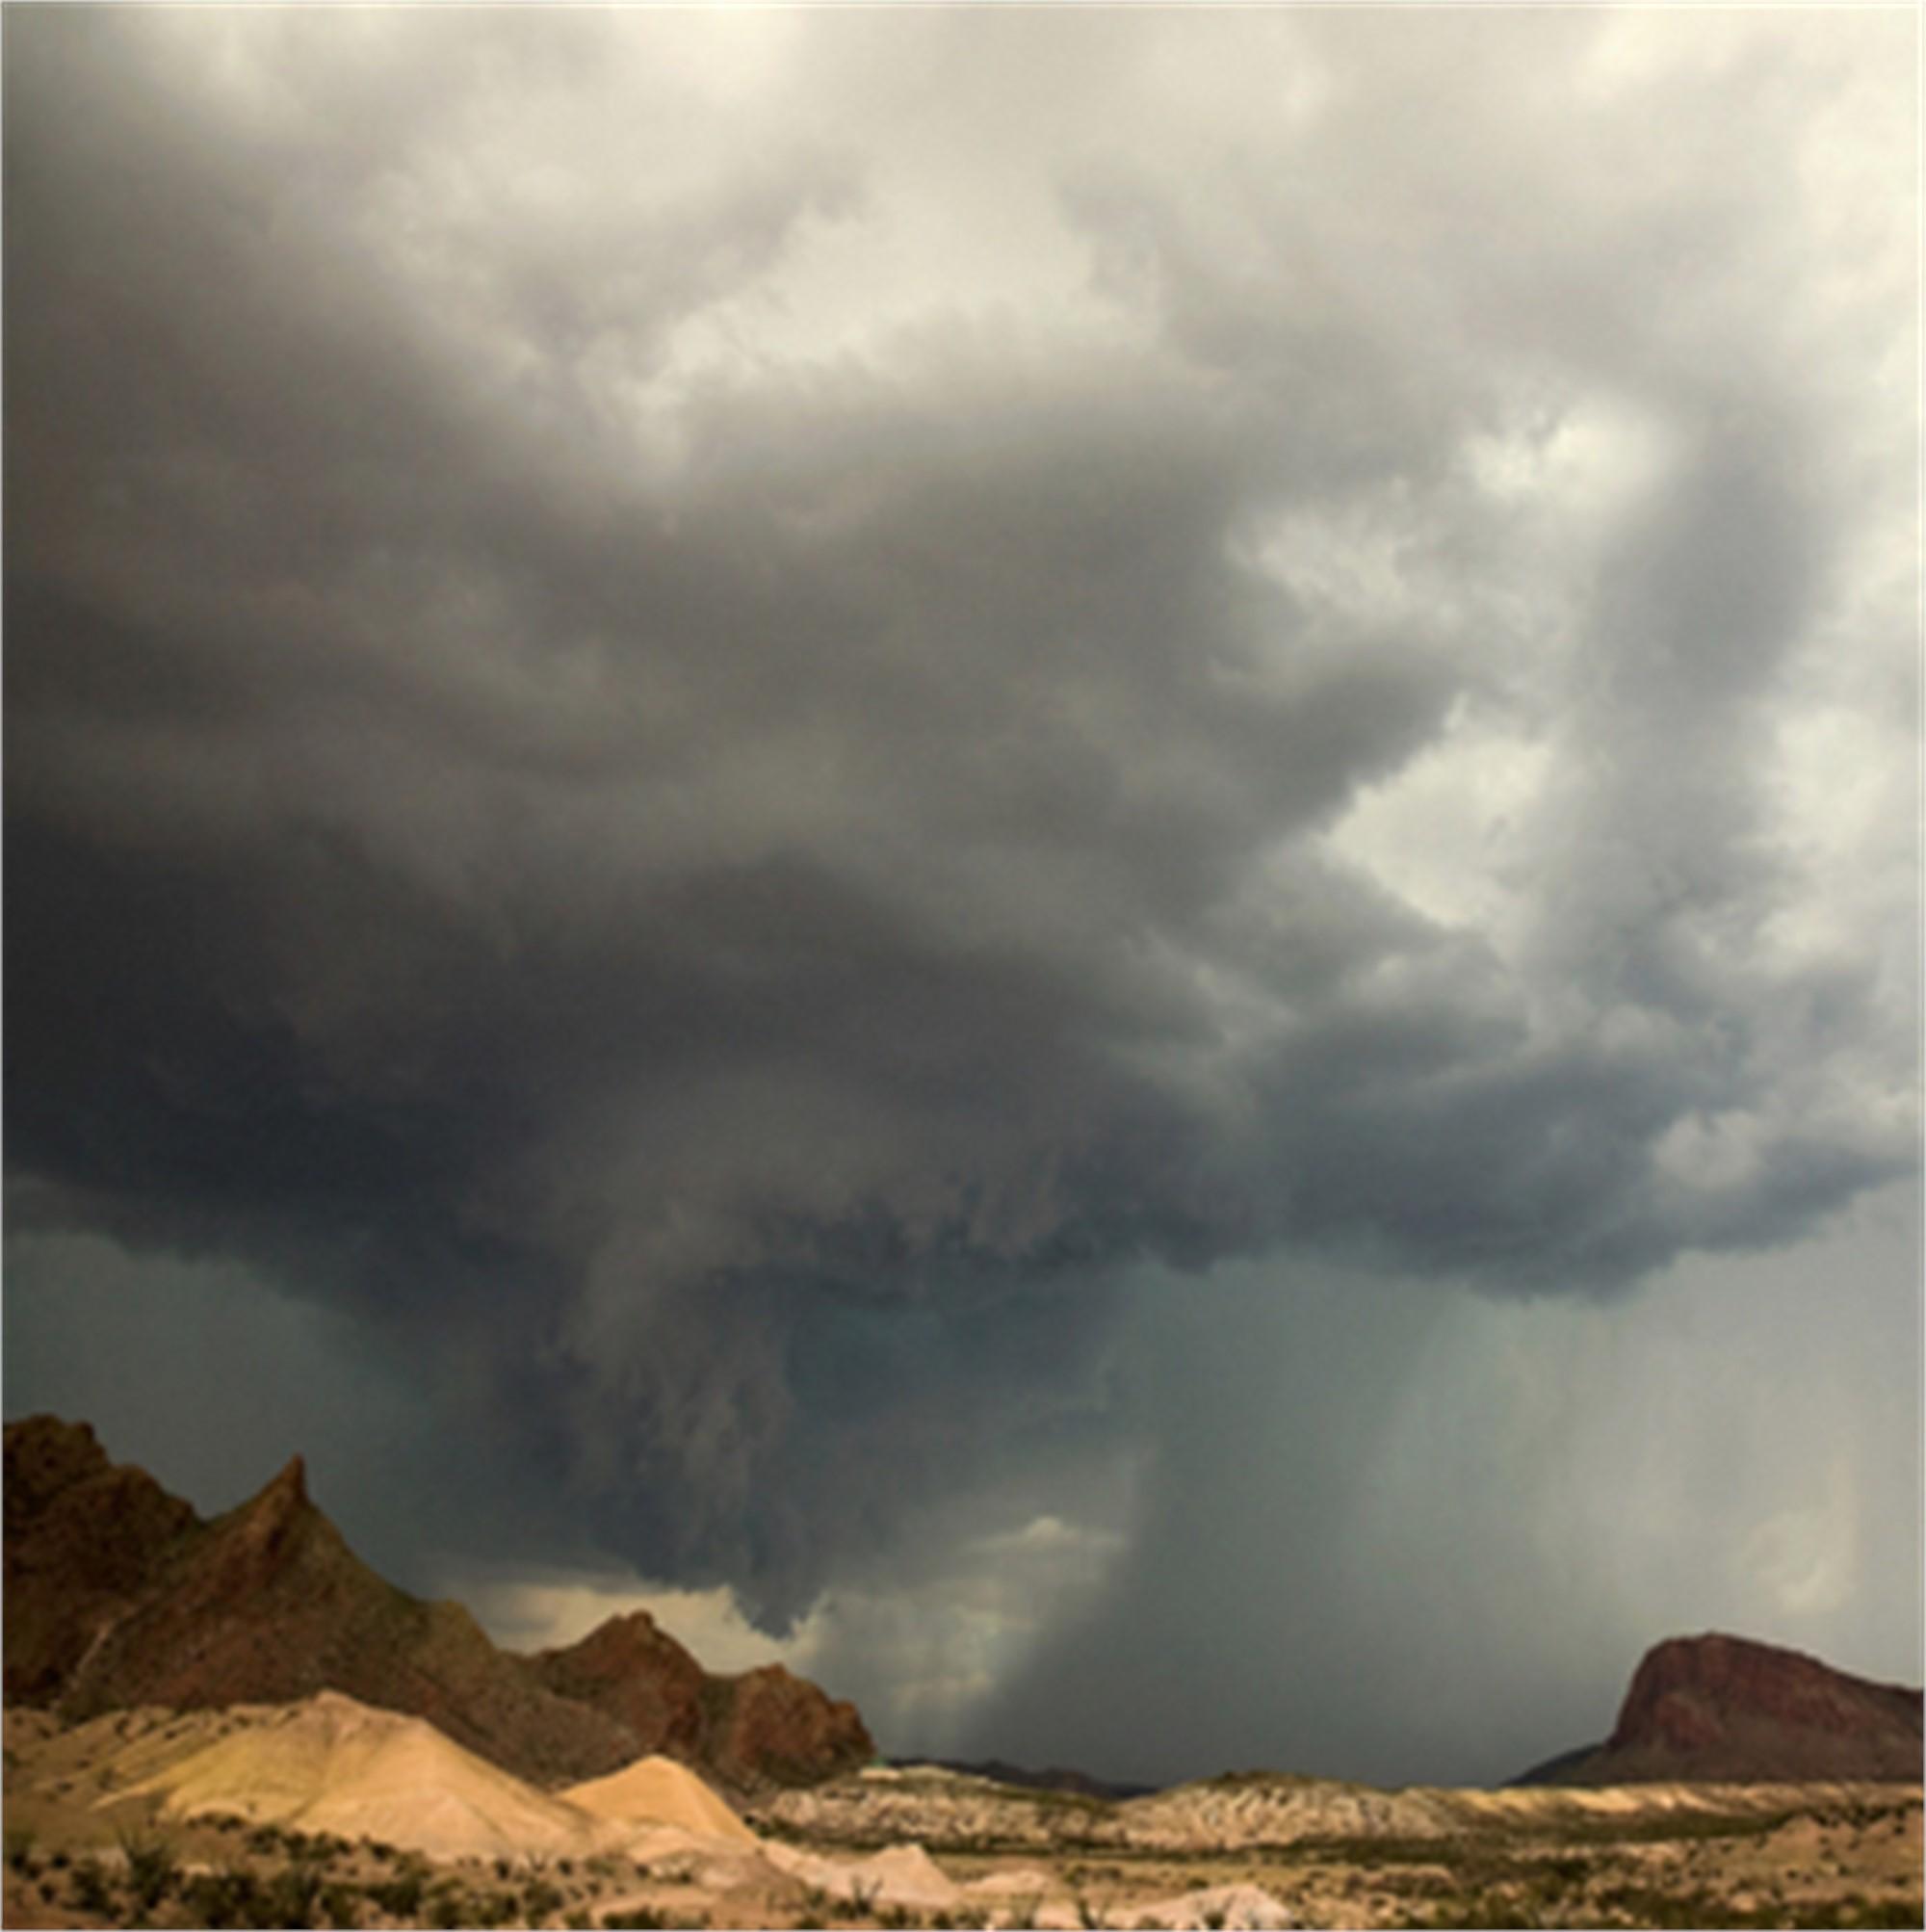 Apache Road by E. Dan Klepper